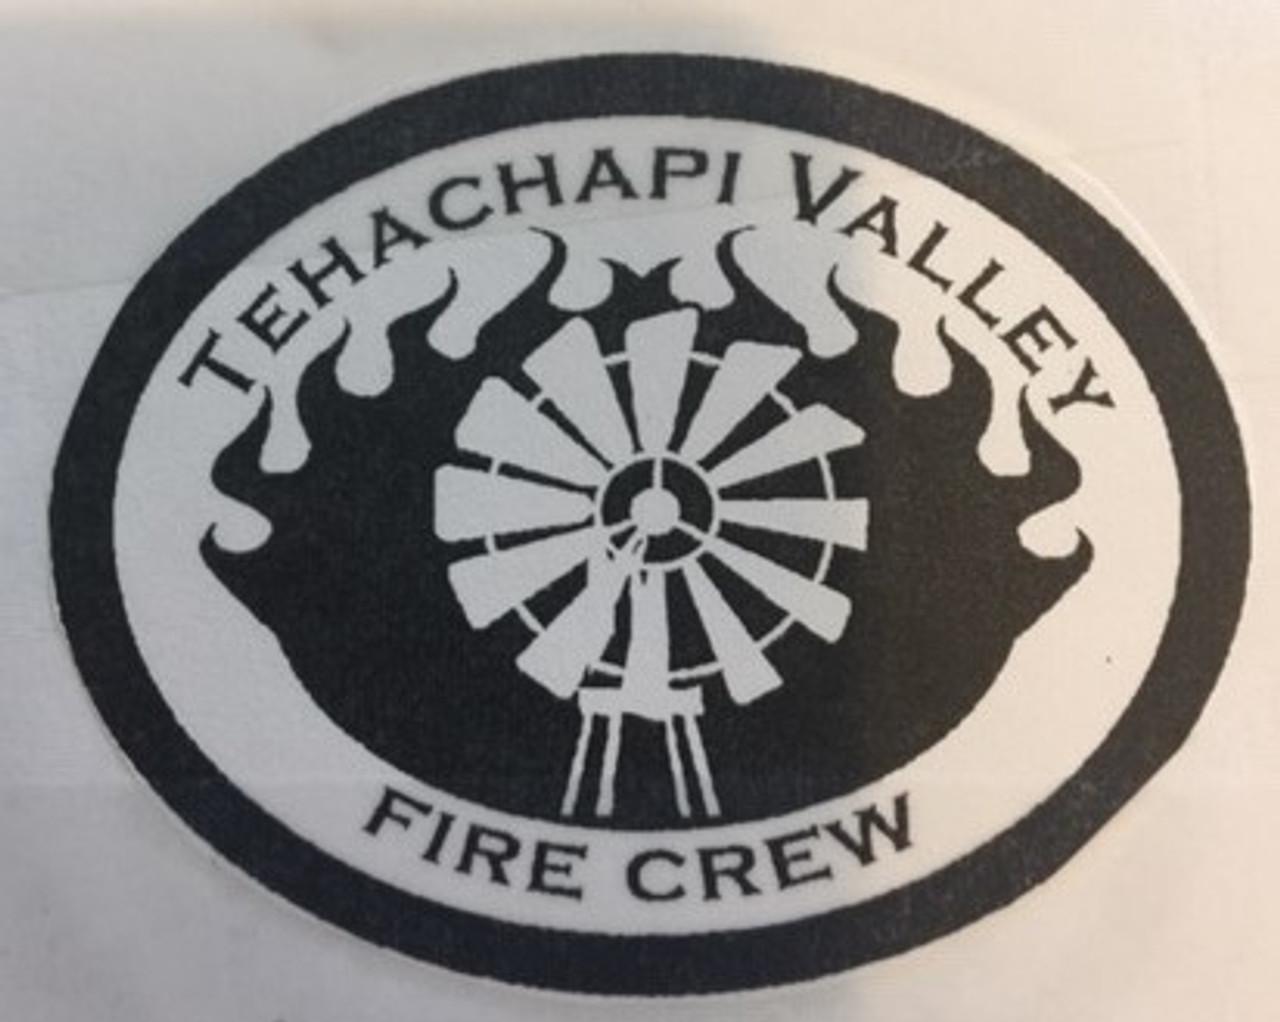 Tehachapi Valley Fire Crew Buckle (RESTRICTED)